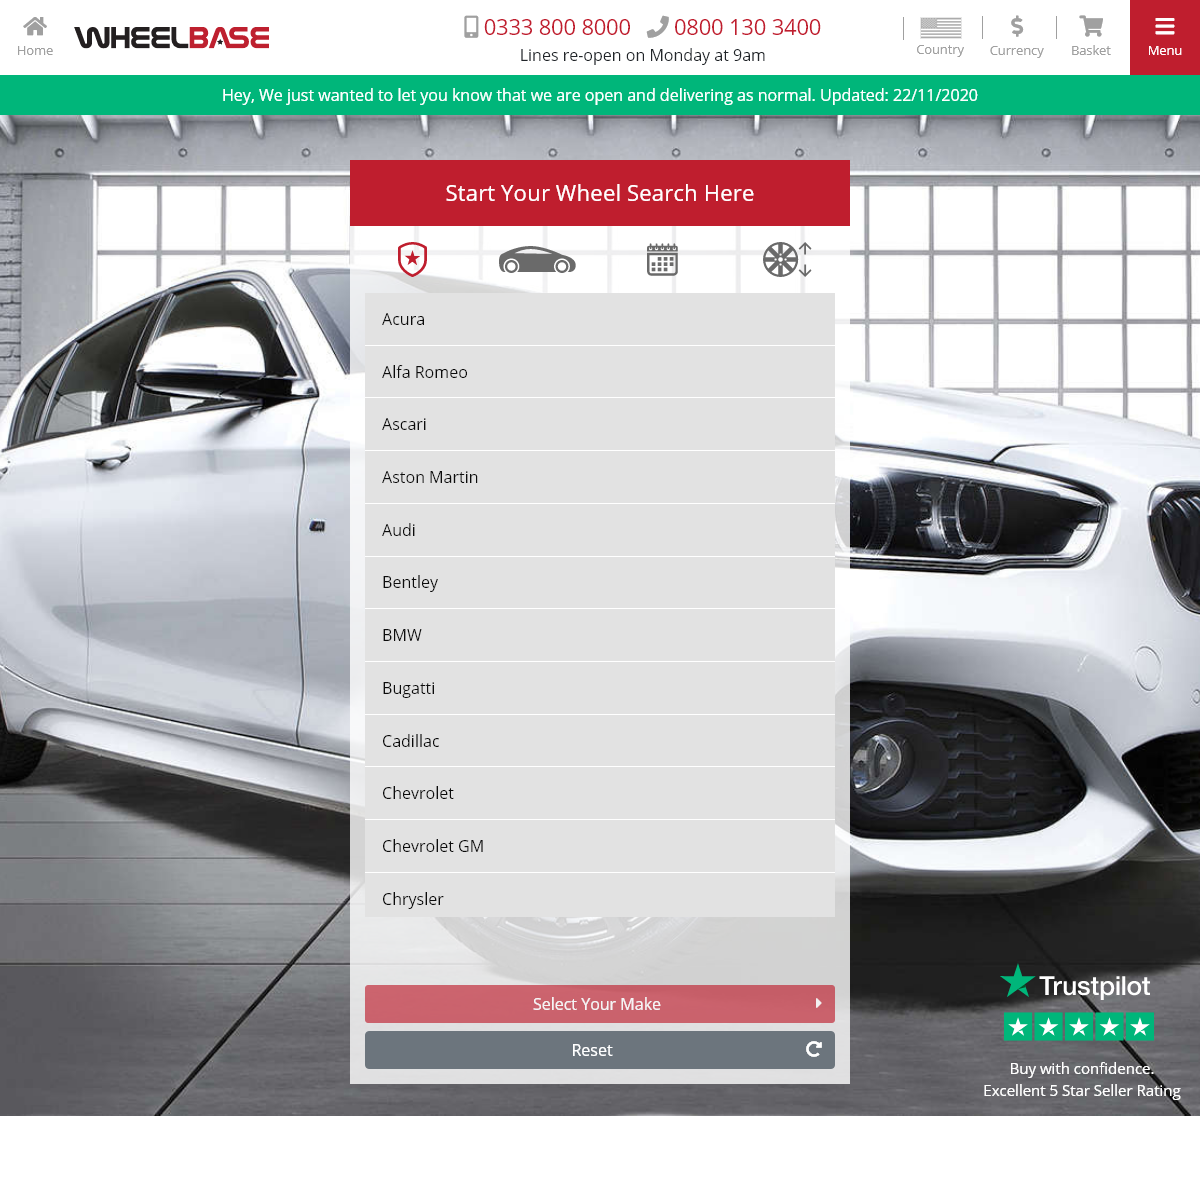 Alloy Wheels & Performance Tyres - Buy Alloys at Wheelbase